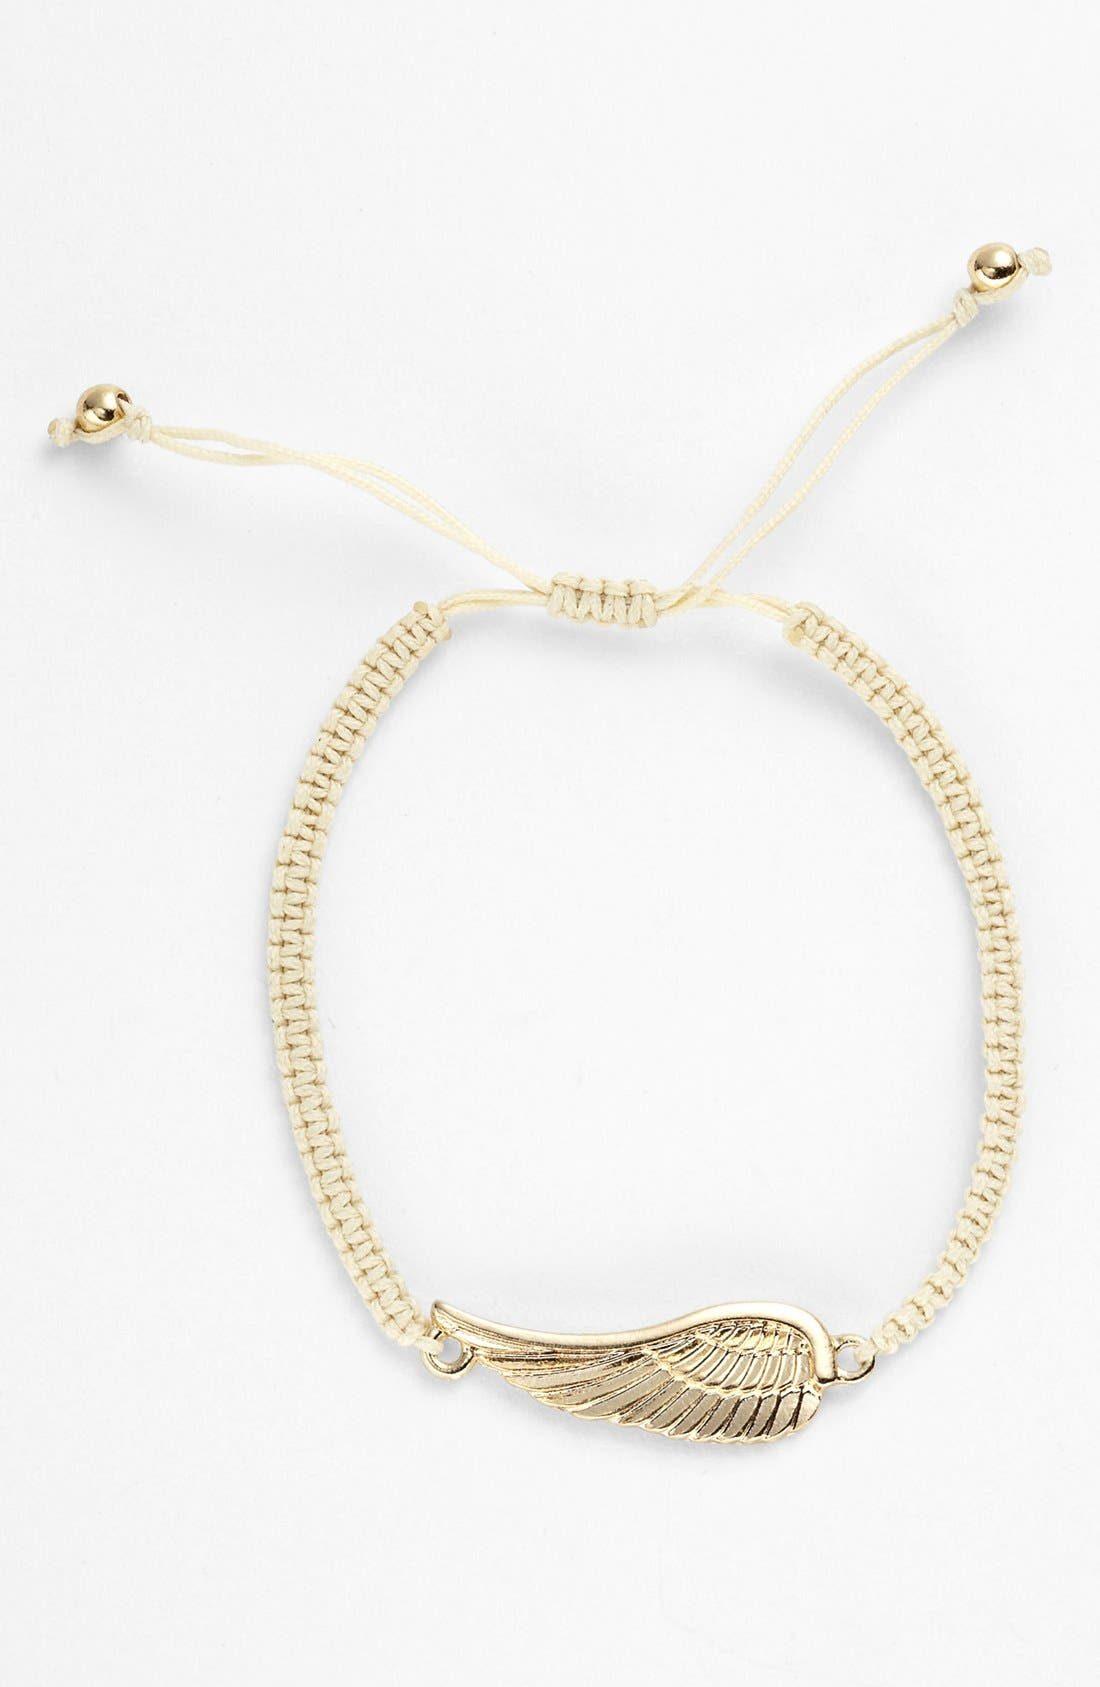 Main Image - NICO NEW YORK 'Angel Wing' Rope Bracelet